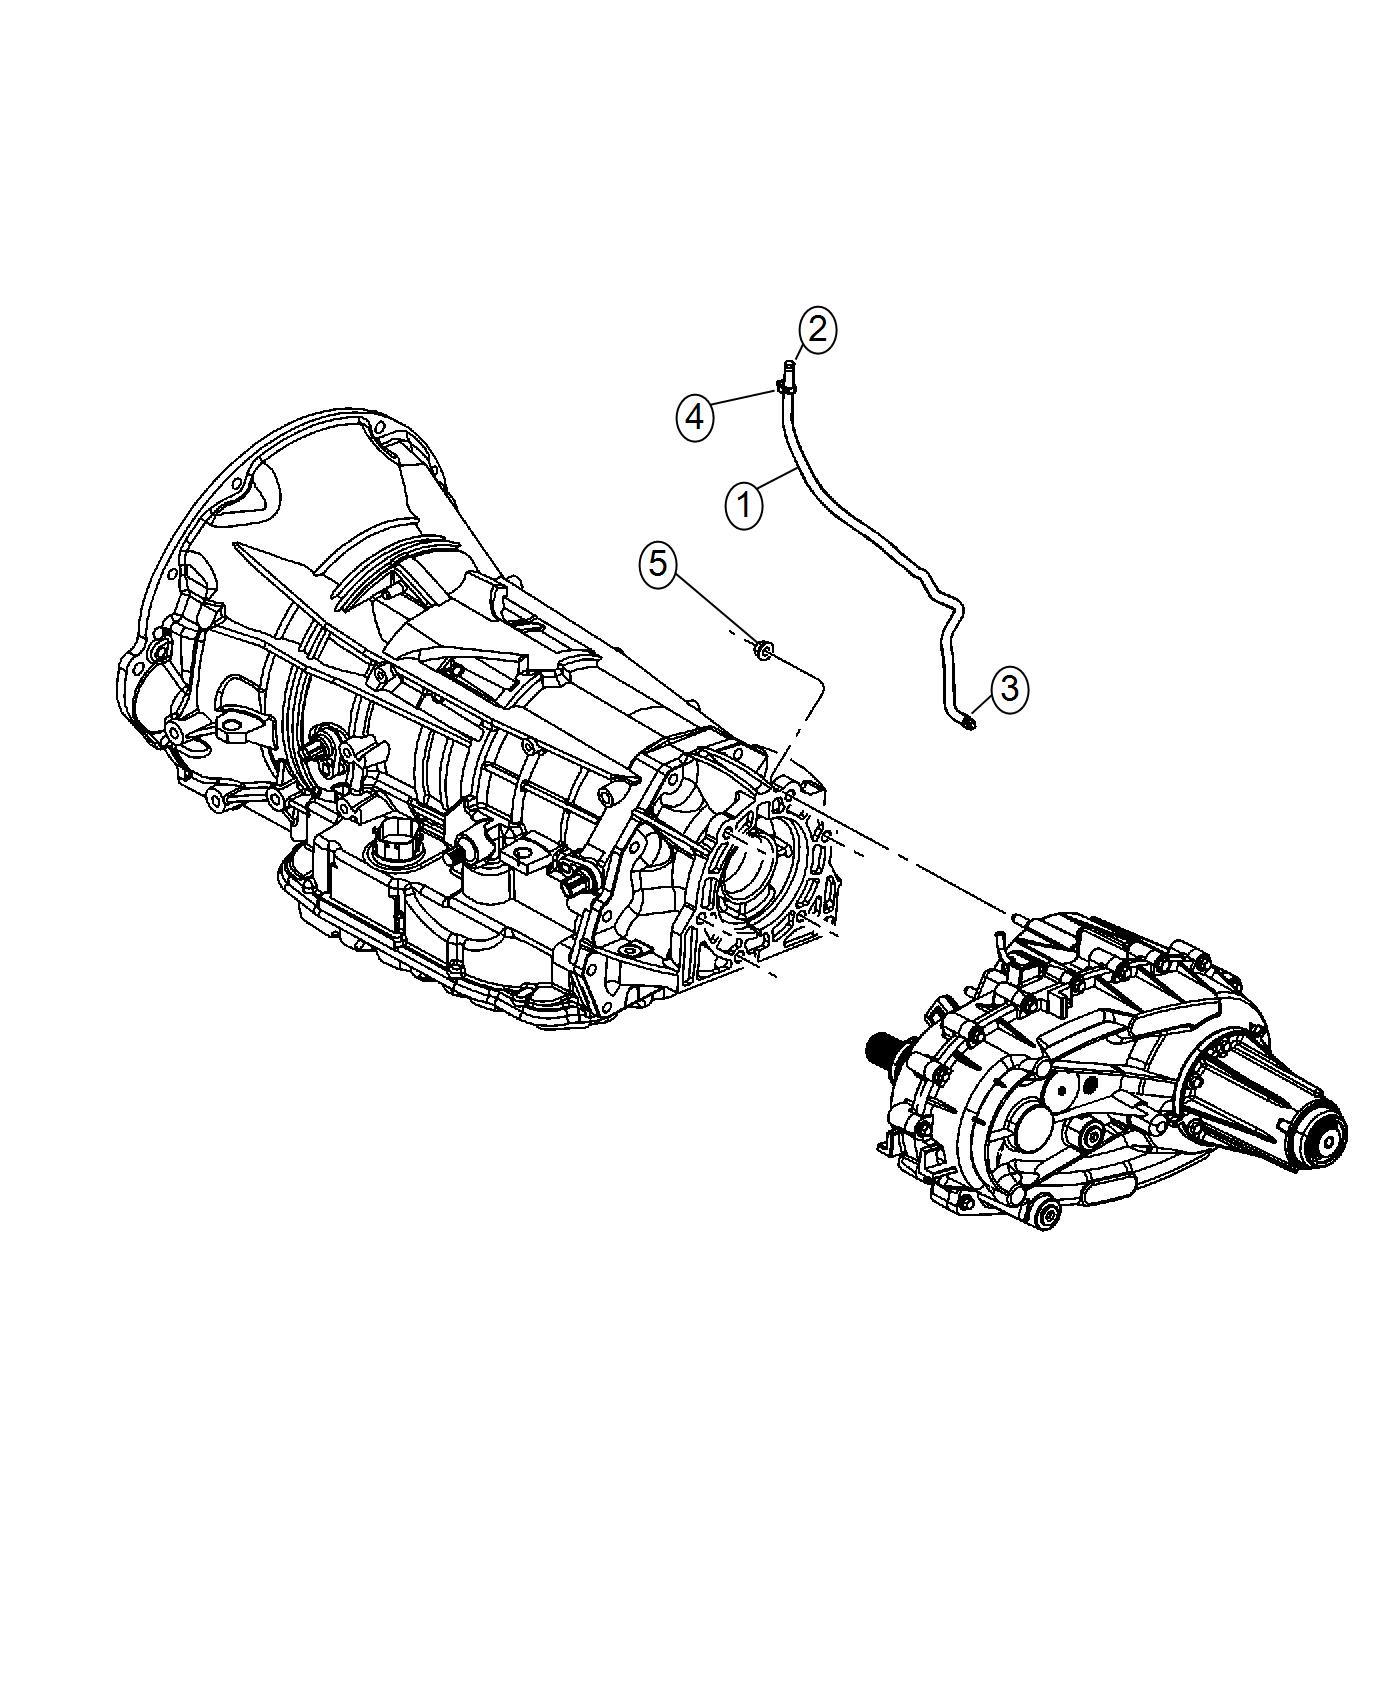 Ram Hose Vent 11 50 Single Wheel Rear Axle